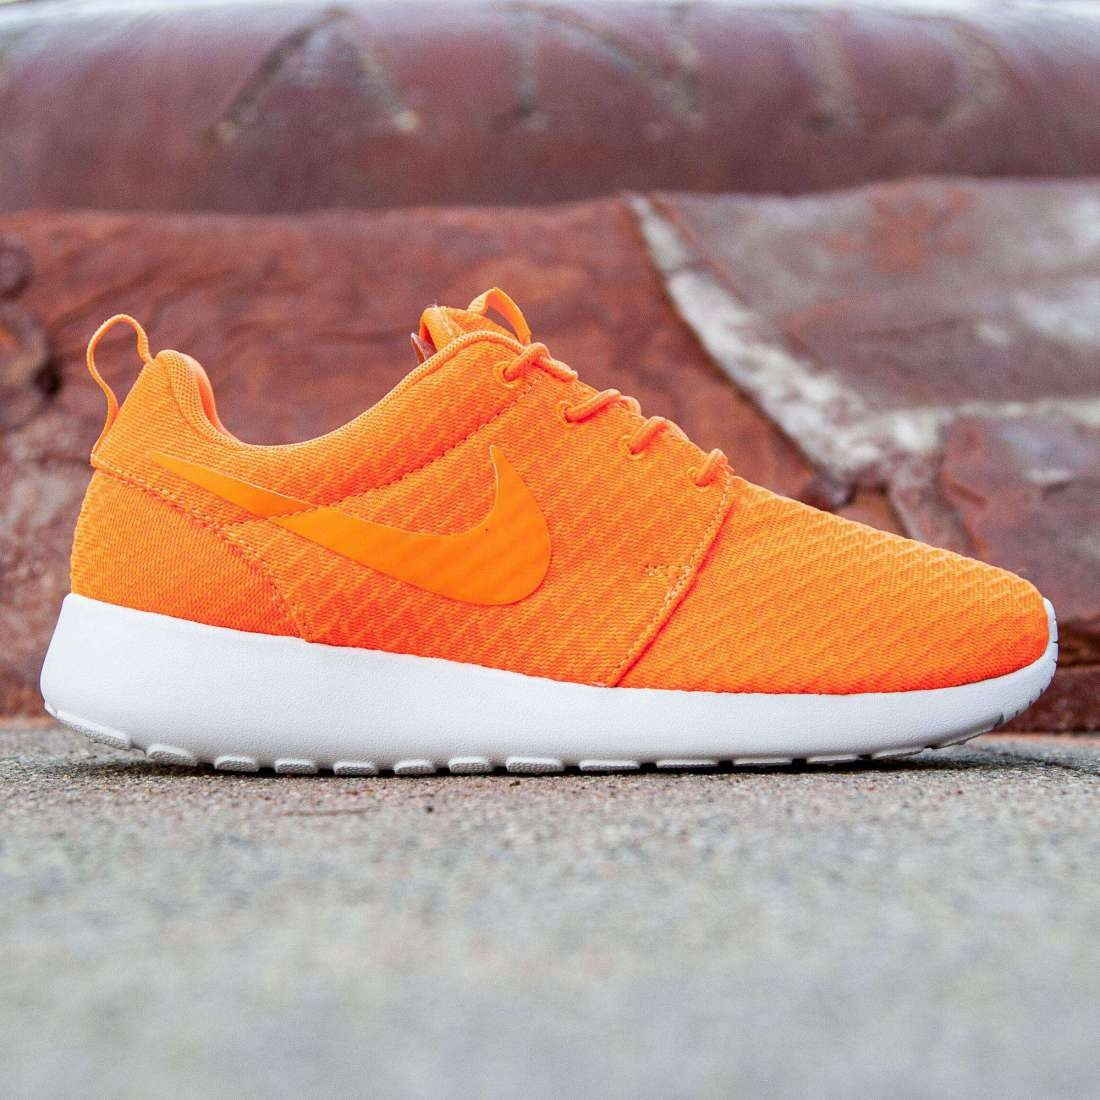 26d39c553acf Nike Women Roshe One orange total orange white